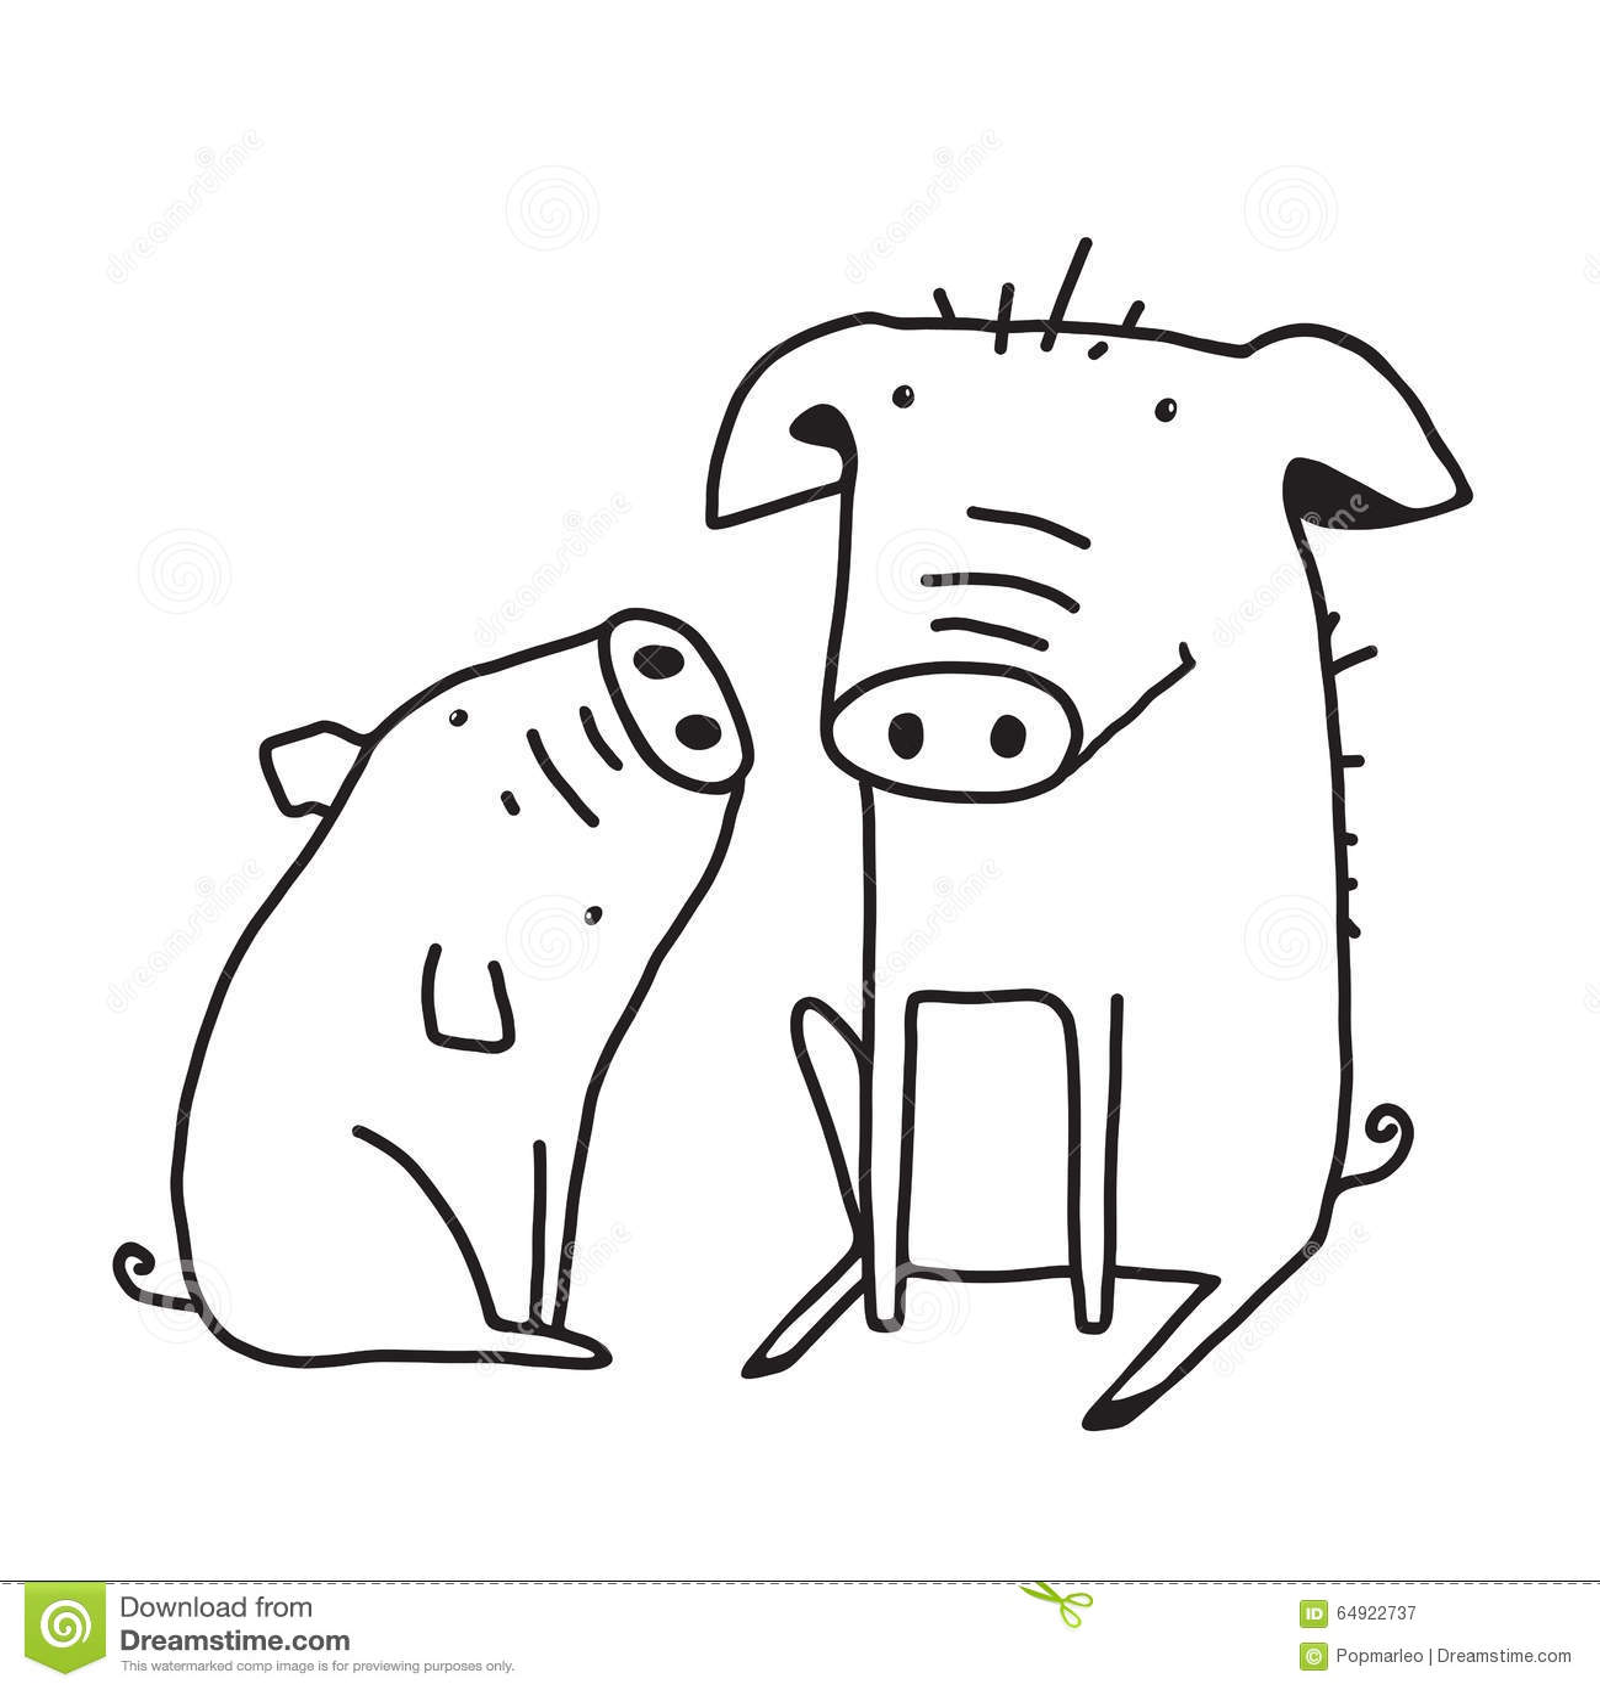 Cute Pigs Outline Funny Illustration For Kids Mom Stock